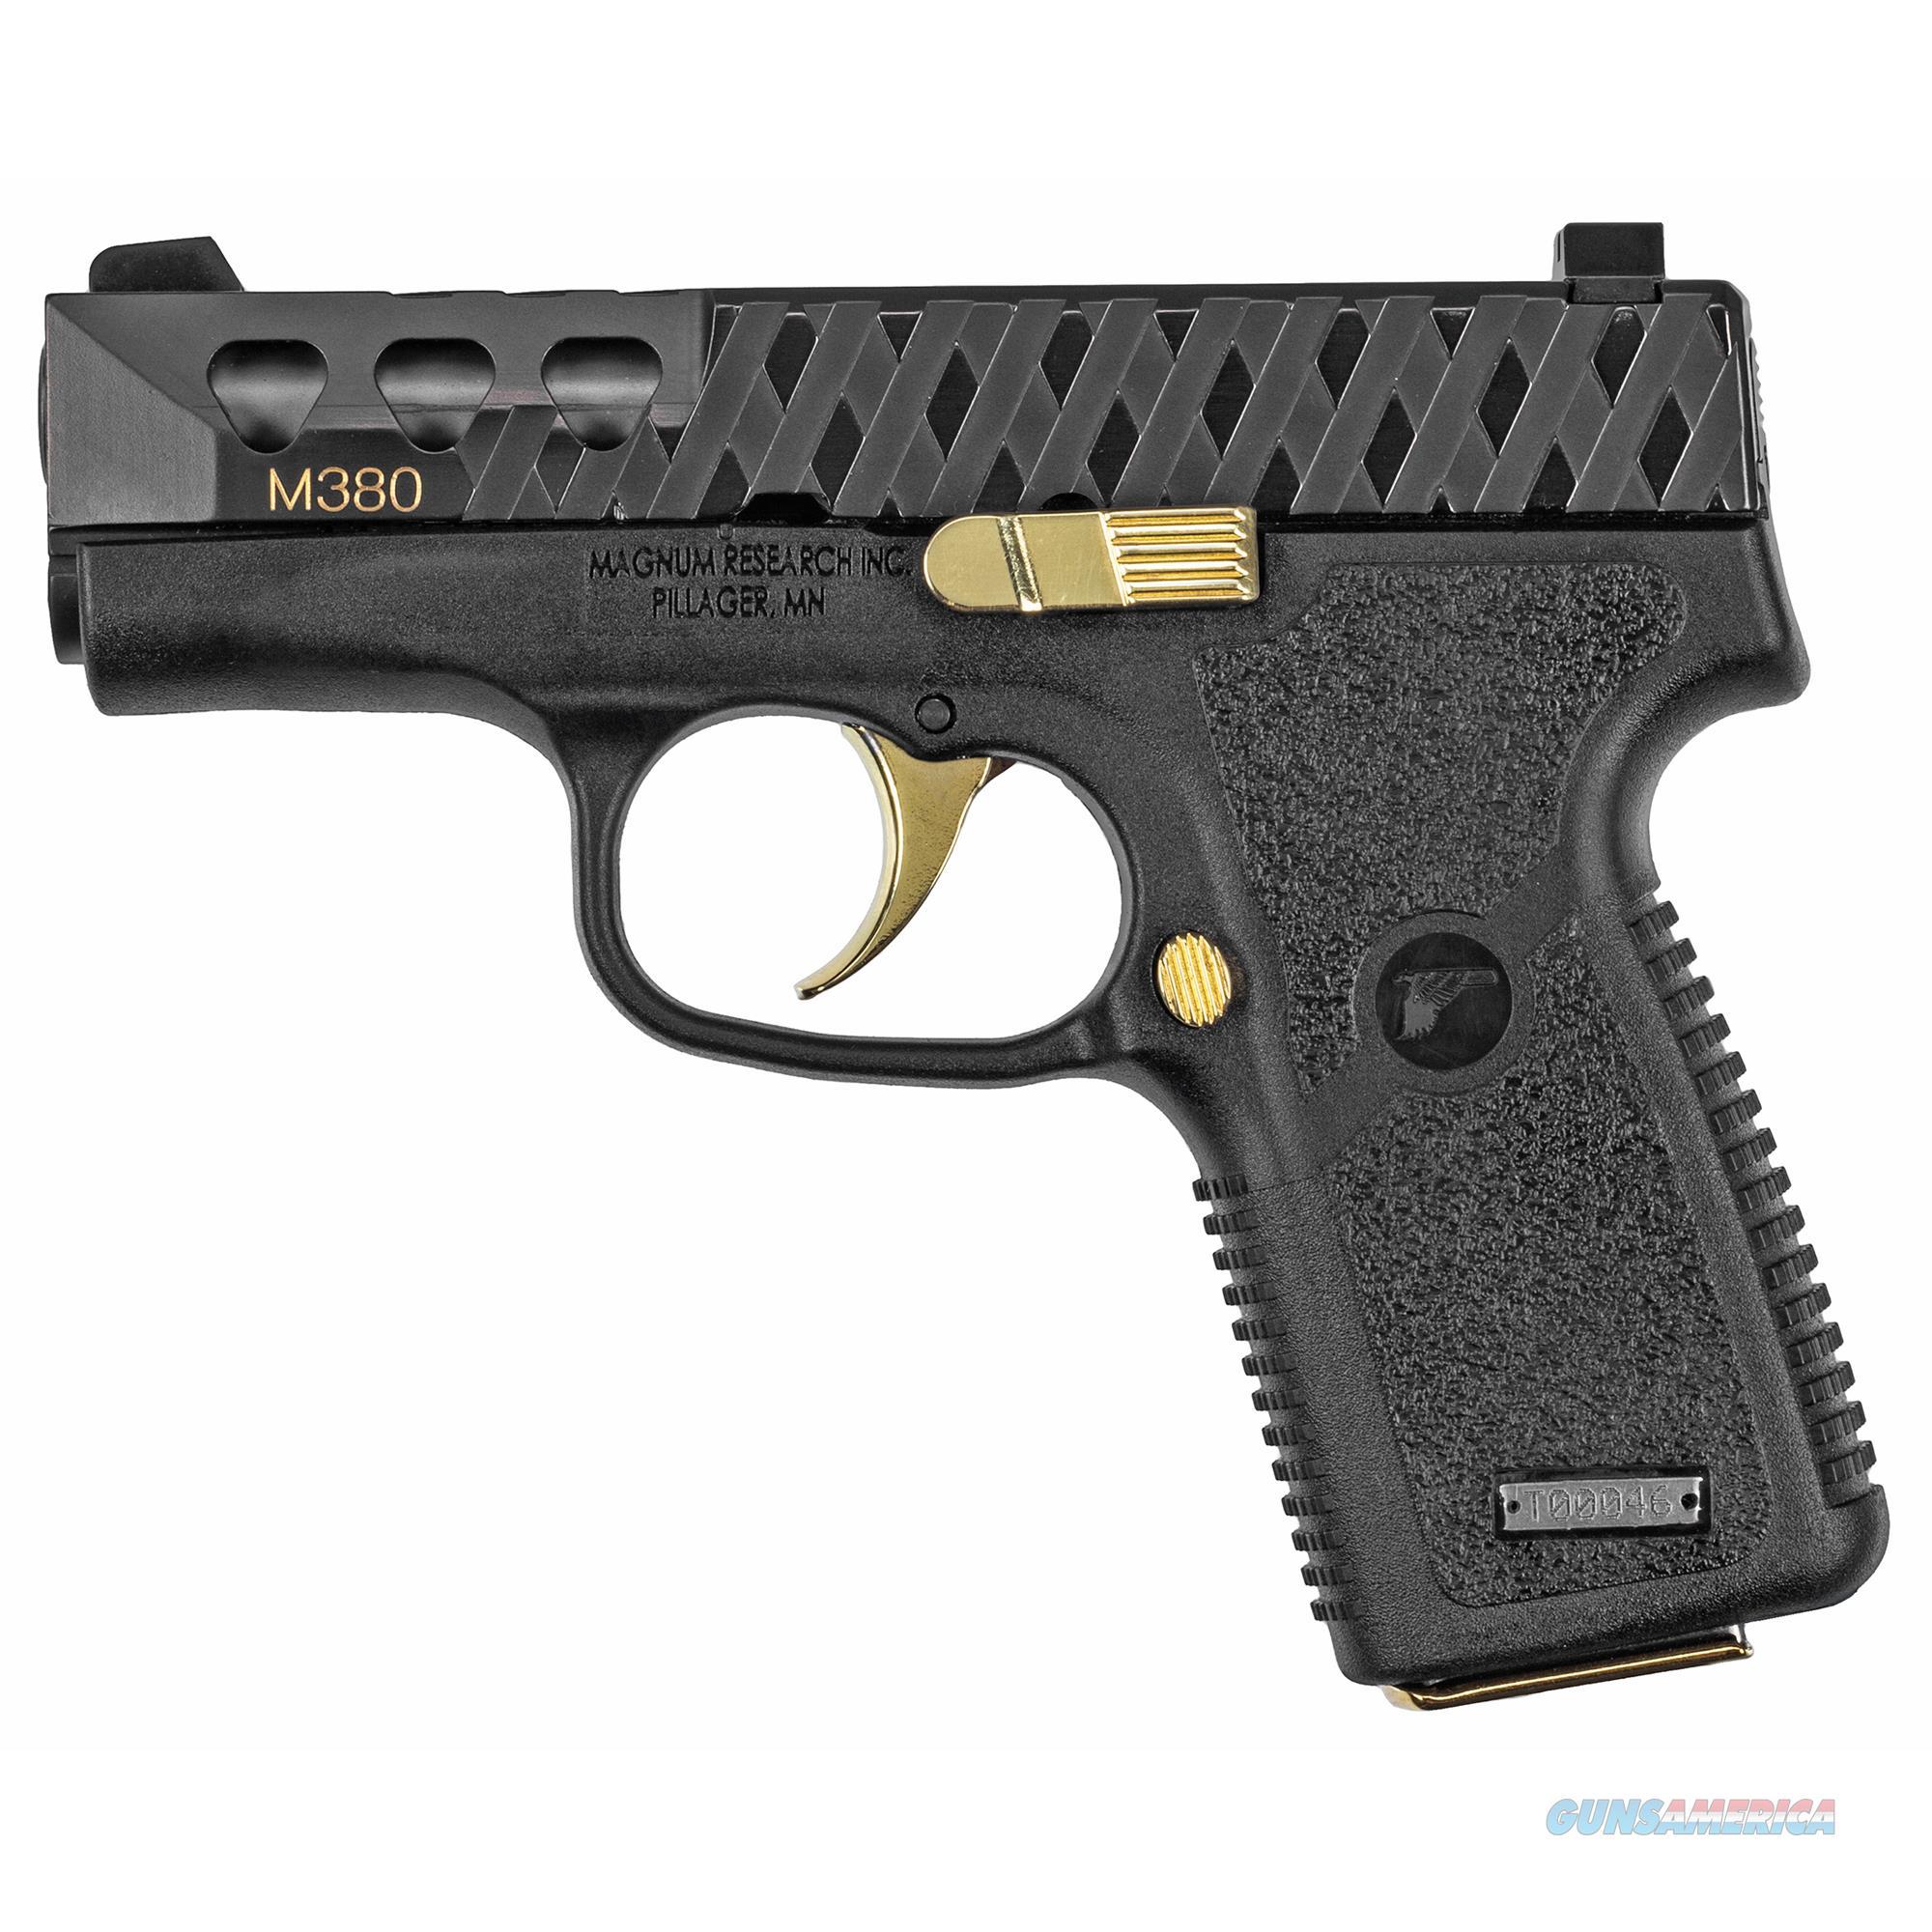 Magnum Research , Mag M380     Pocket Pistol 380acp 7rd Blk-gold  Guns > Pistols > 1911 Pistol Copies (non-Colt)